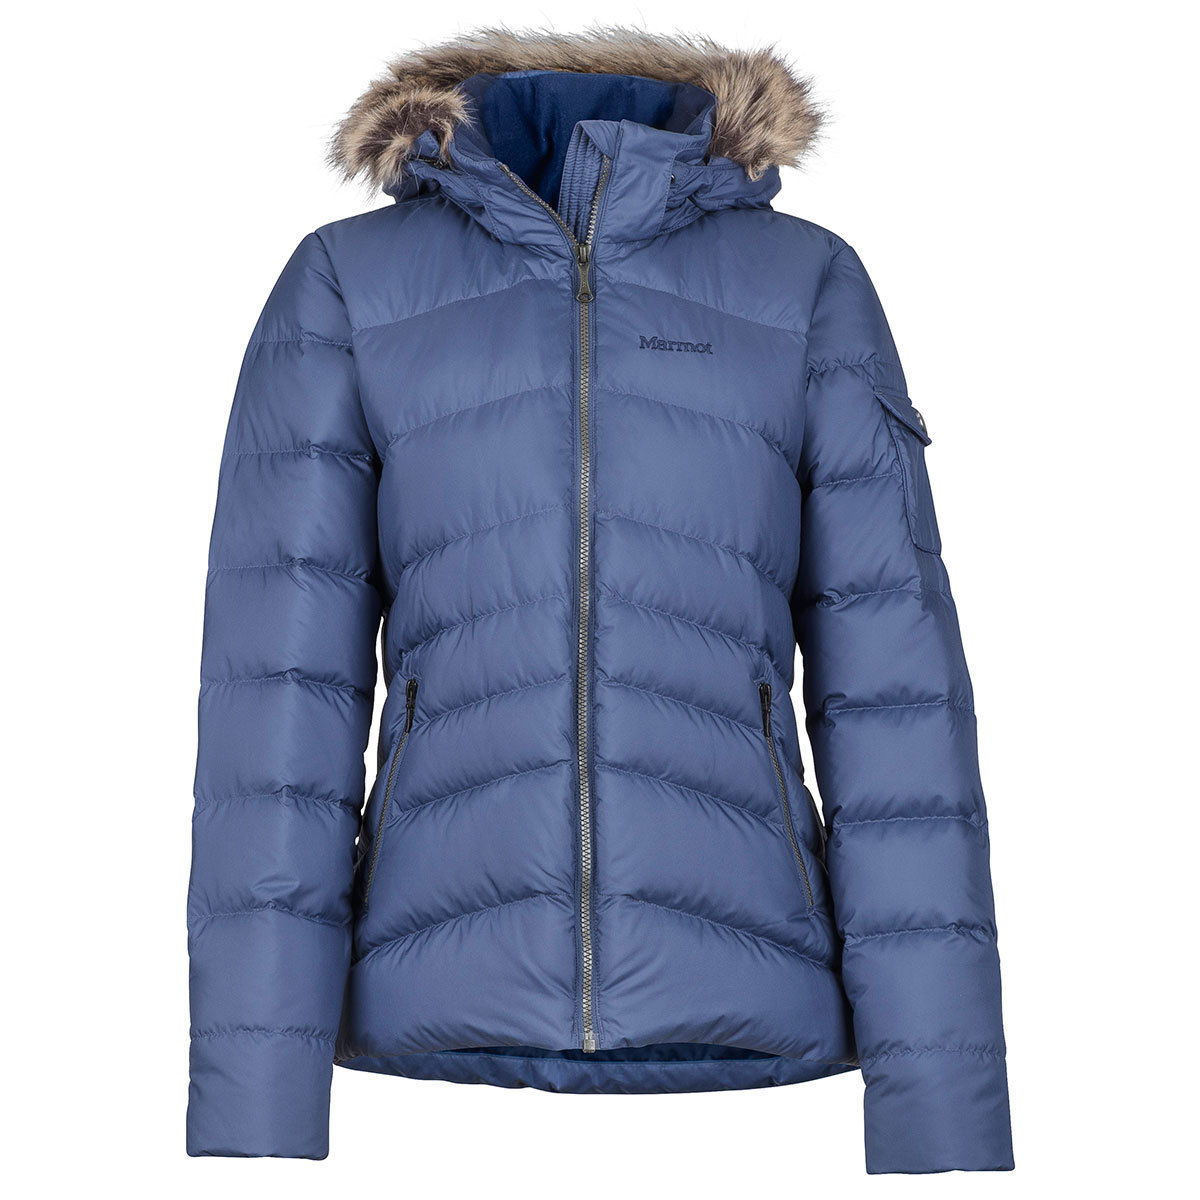 Marmot Woman's Ithaca Jacket - Blue, L